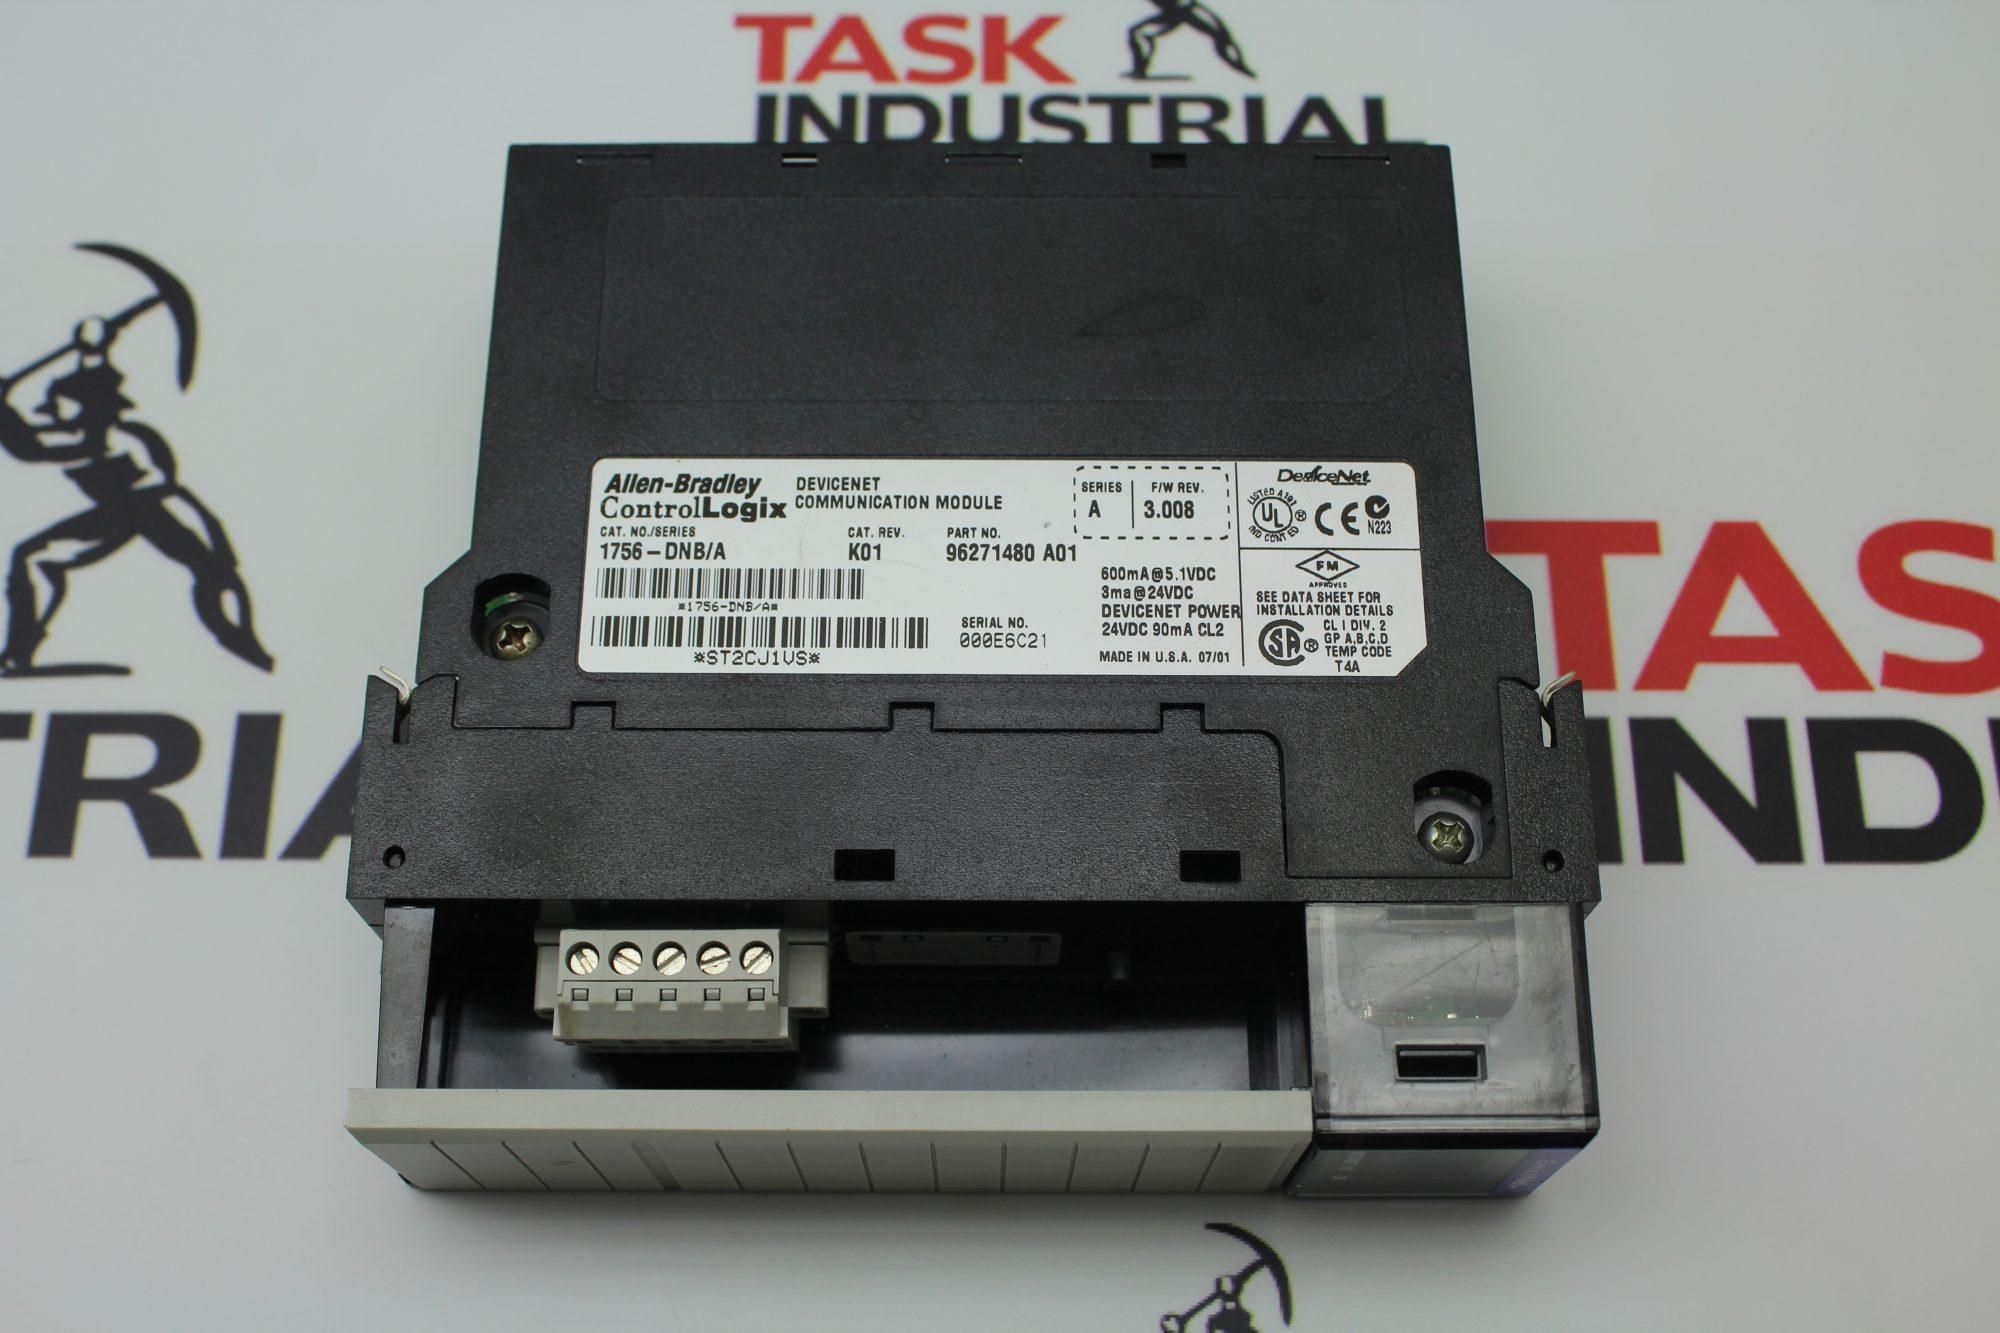 Allen Bradley ControlLogix 1756-DNB A Ethernet Communication Module FW 3 008